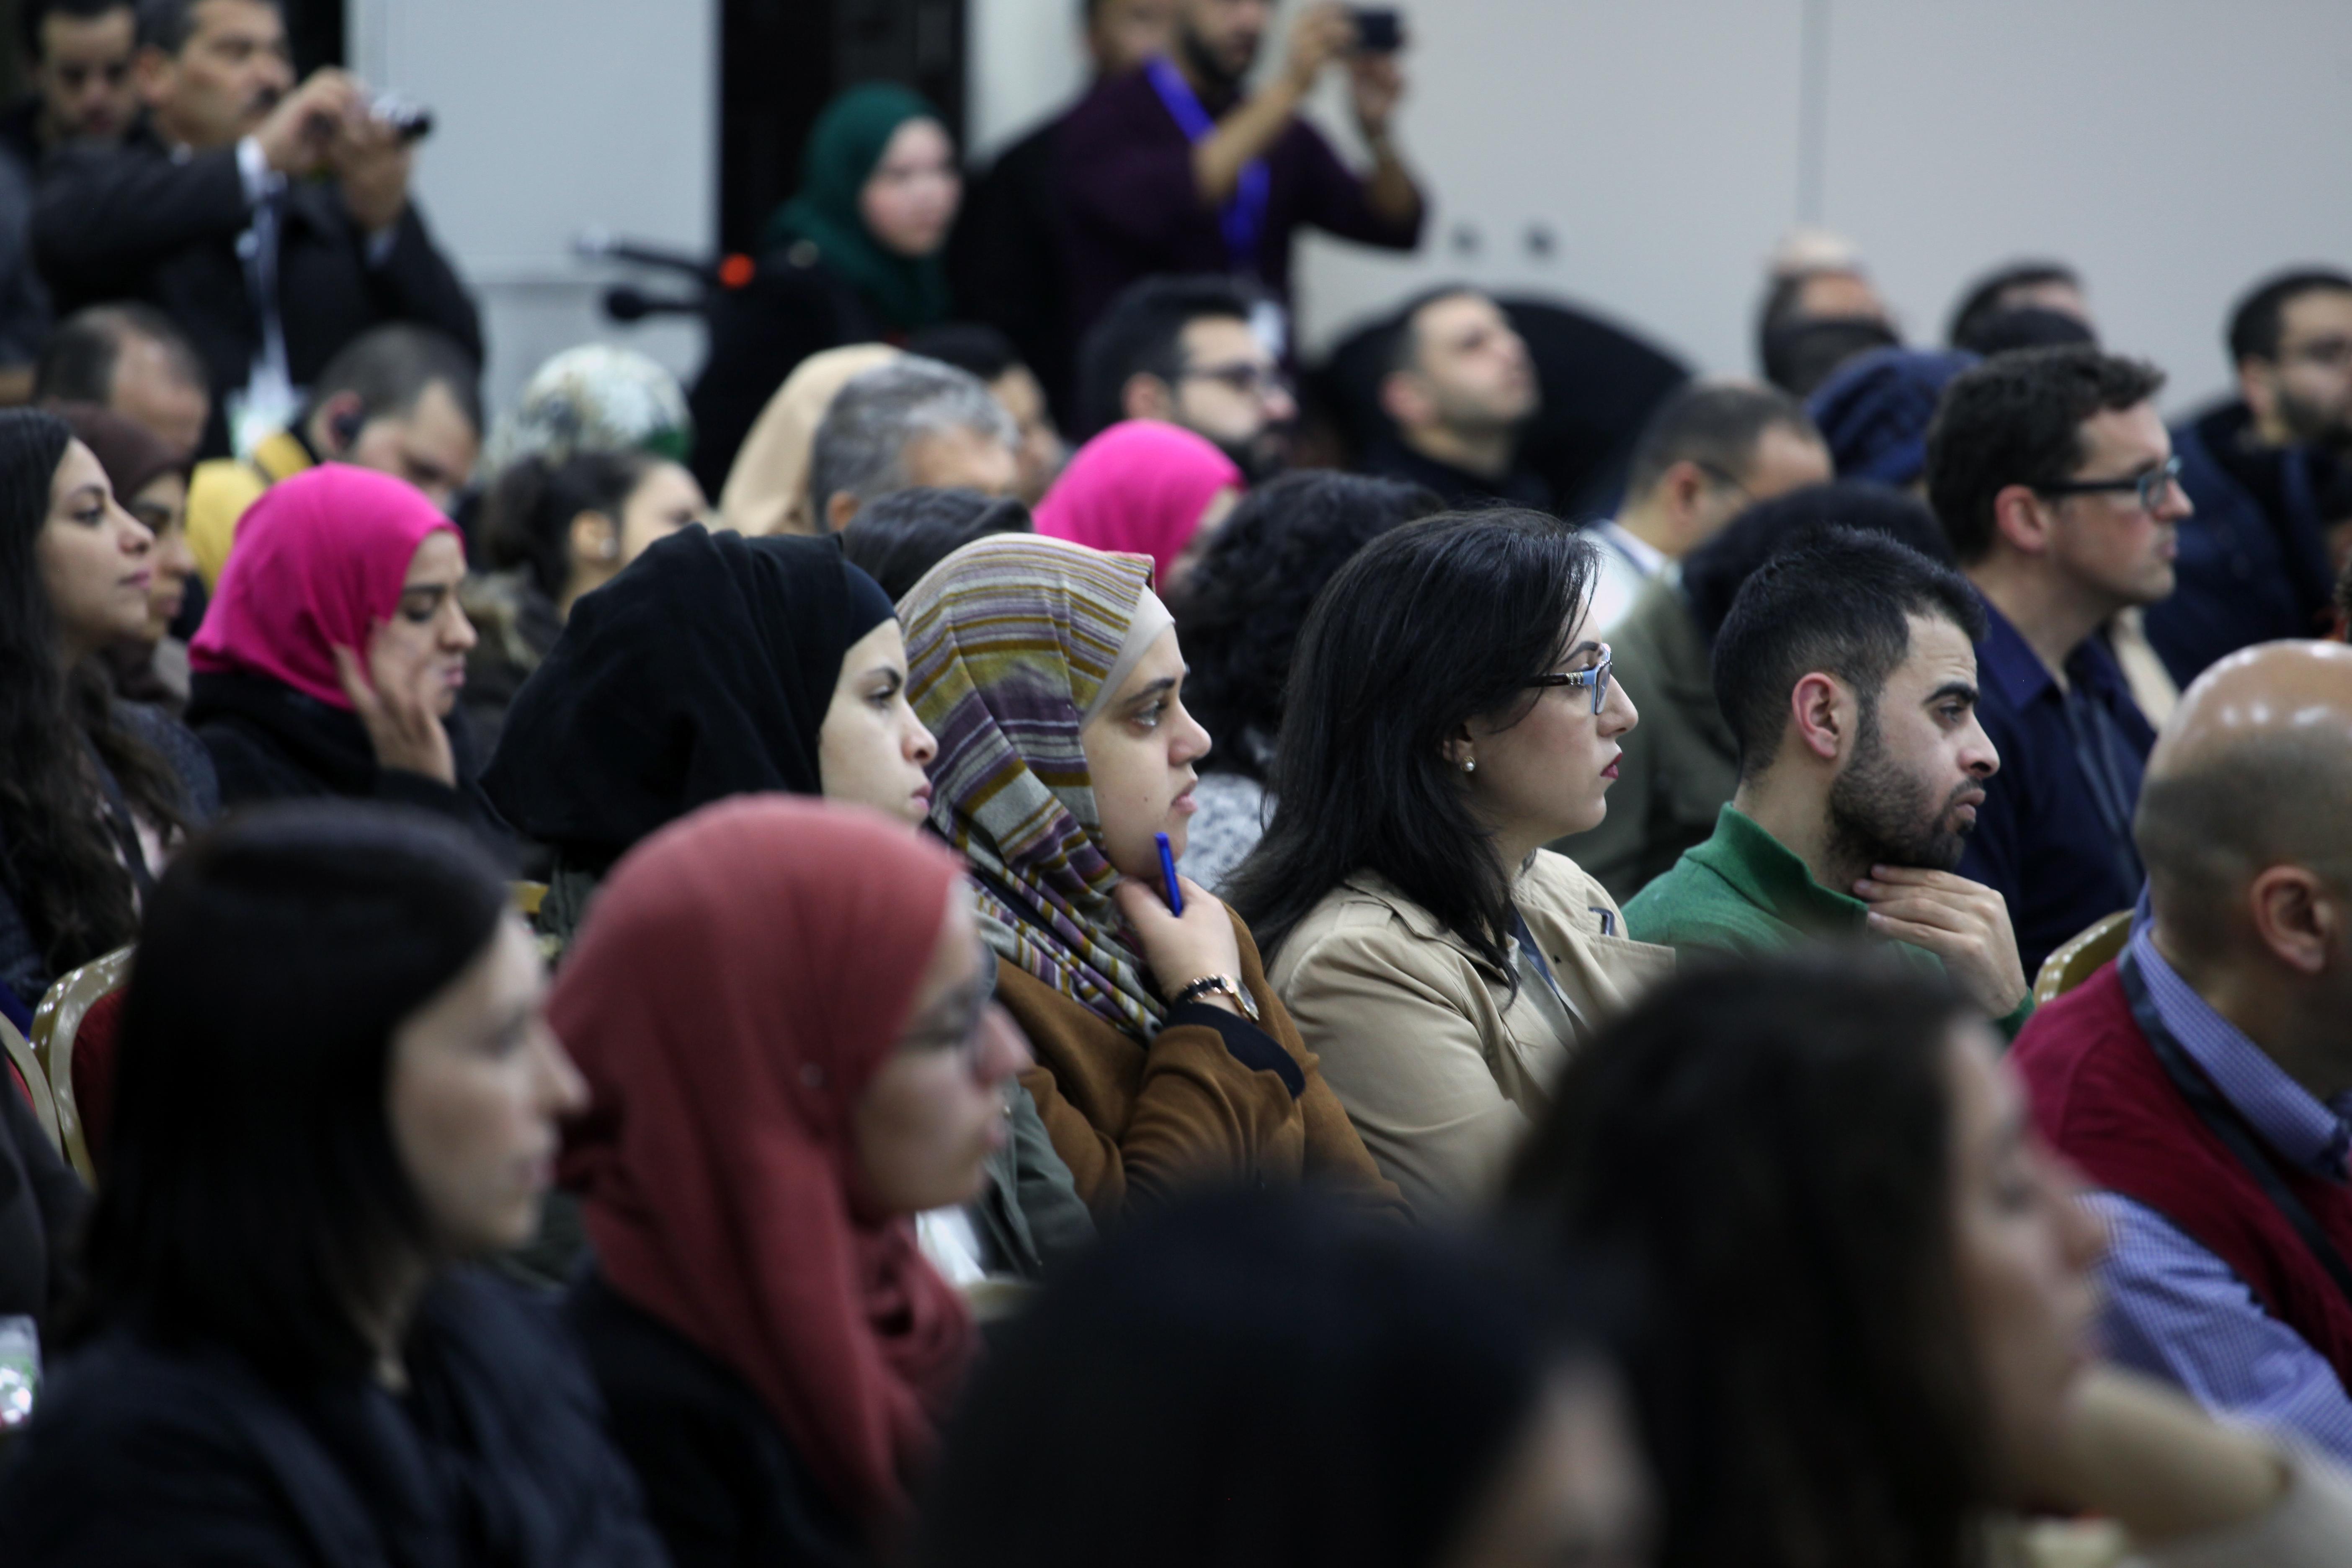 Audience members at 7amleh's Palestine Digital Activism Forum, Ramallah, West Bank, January 18, 2018. (Courtesy of 7amleh)